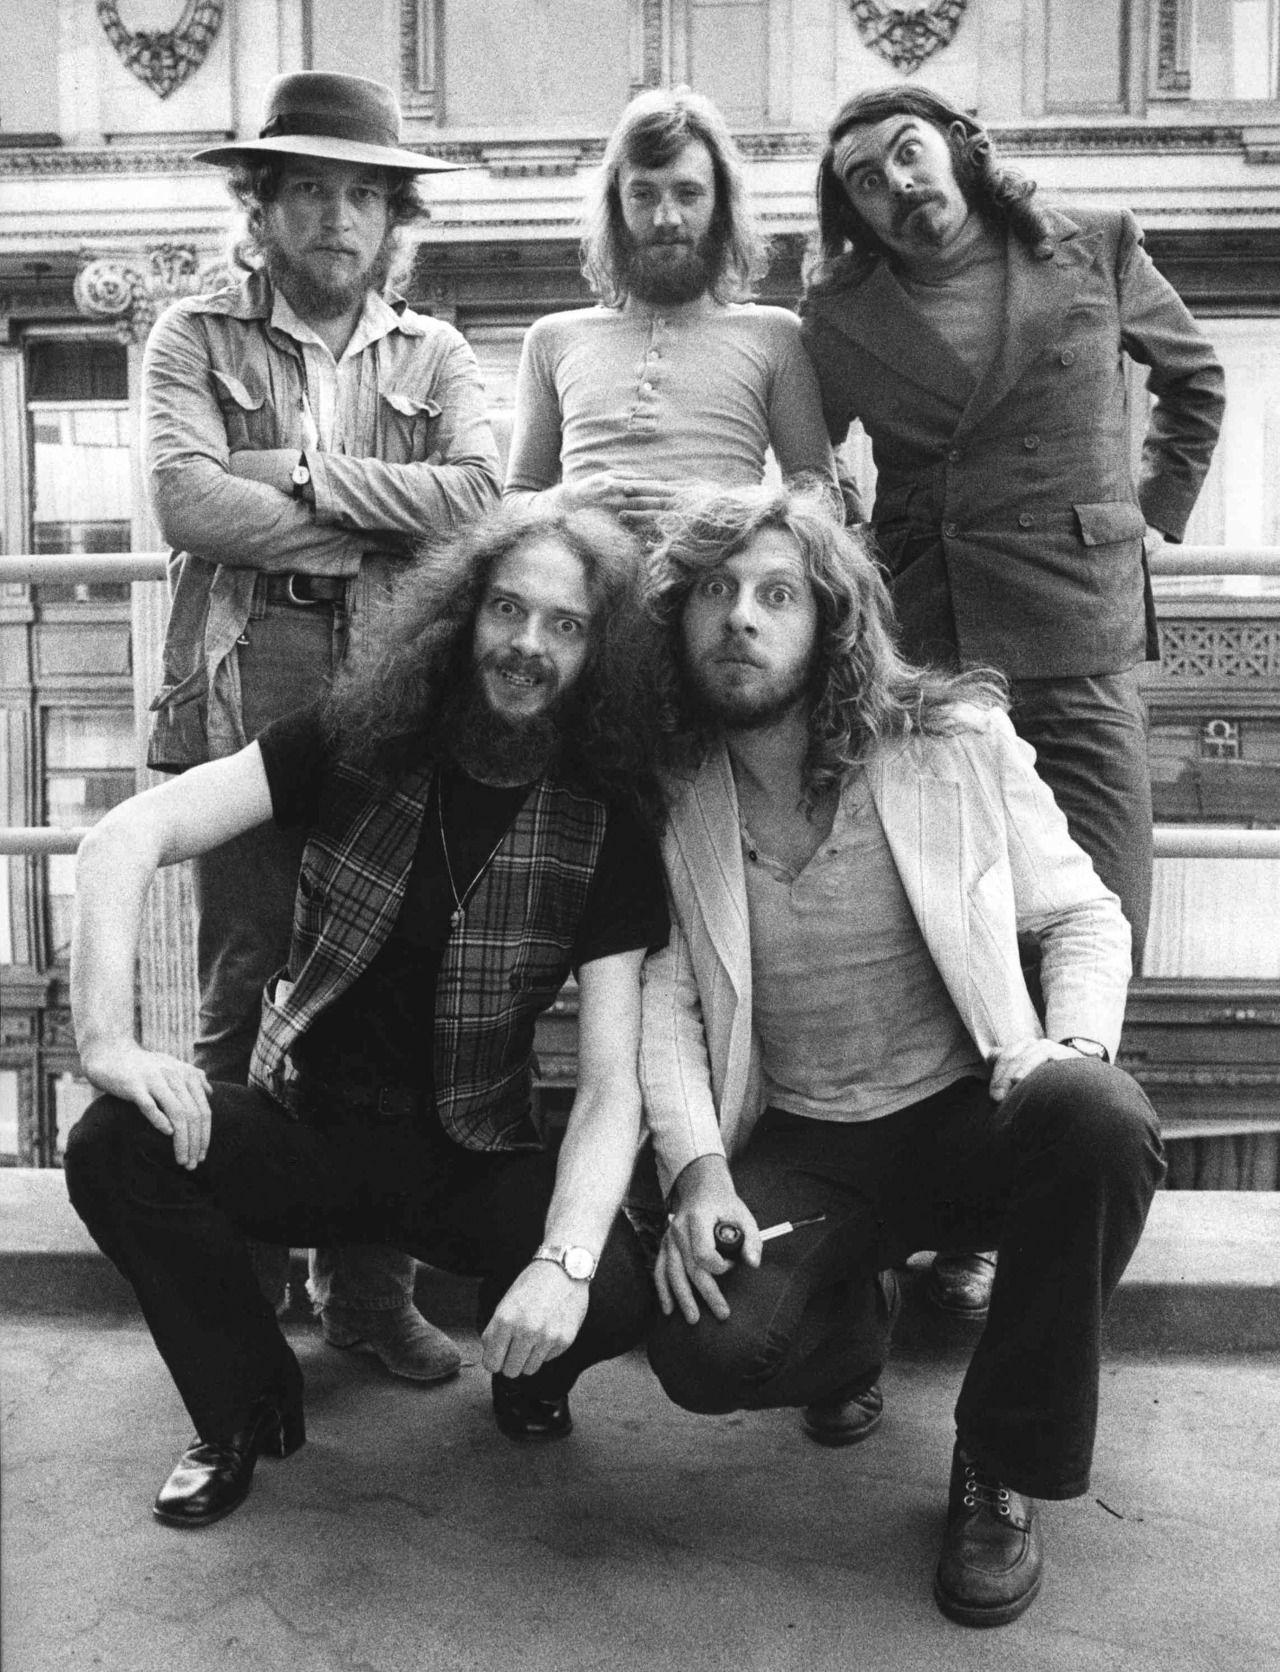 Jethro Tull - Ian Anderson